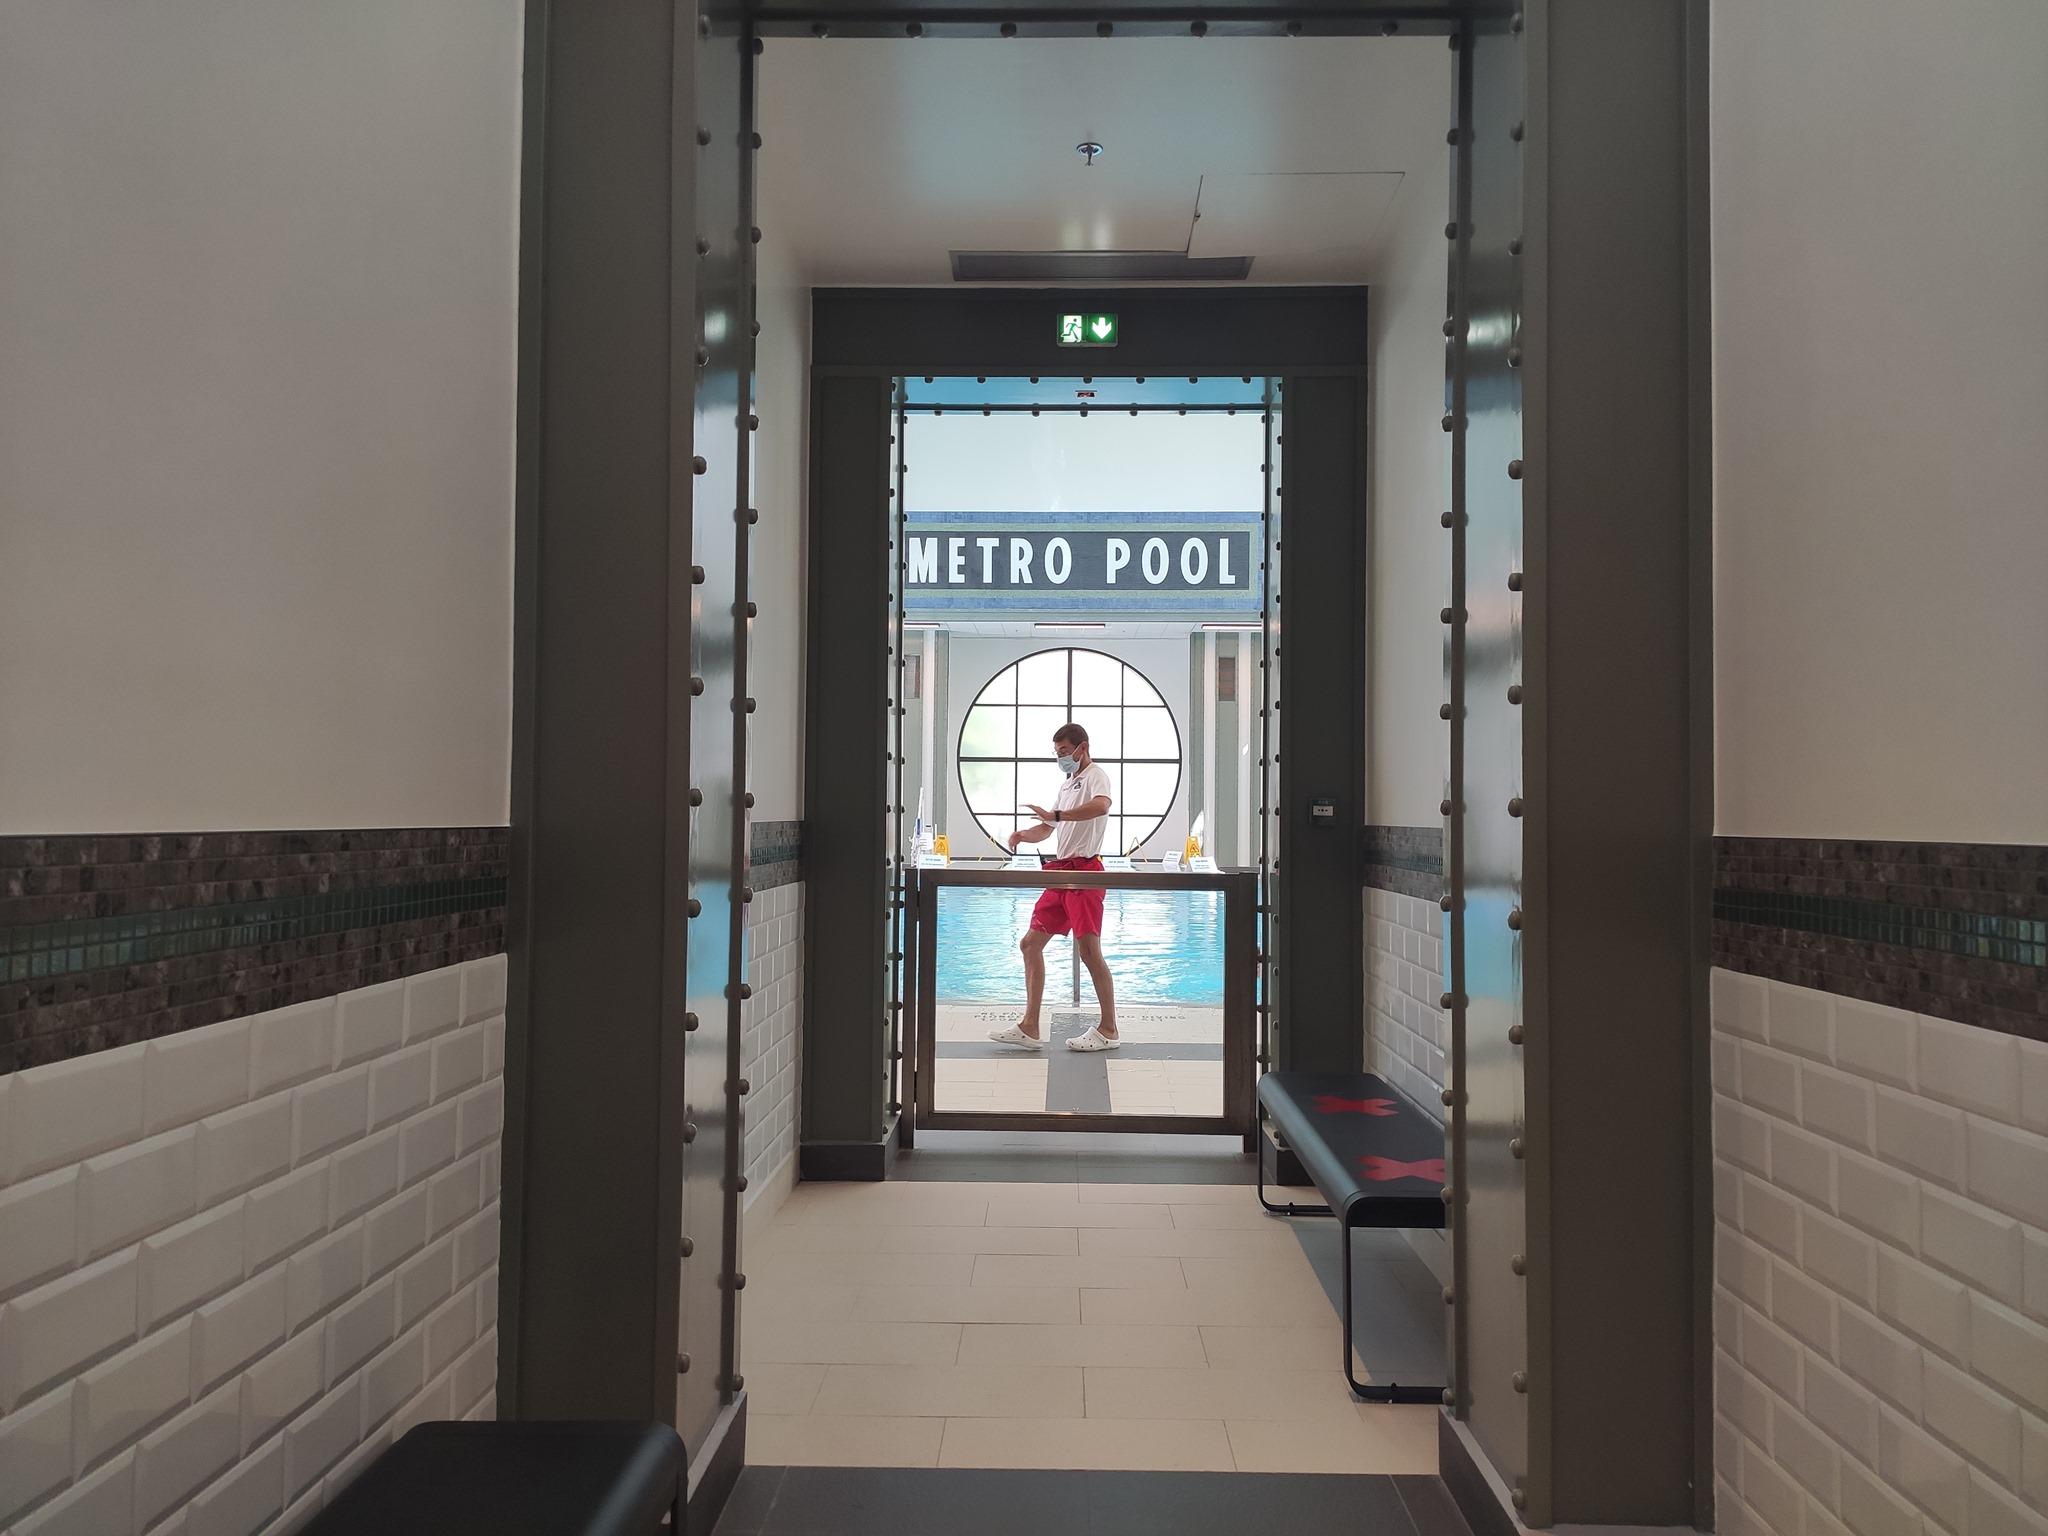 Piscine Metro Pool - Disney's Hotel New York - The Art of Marvel